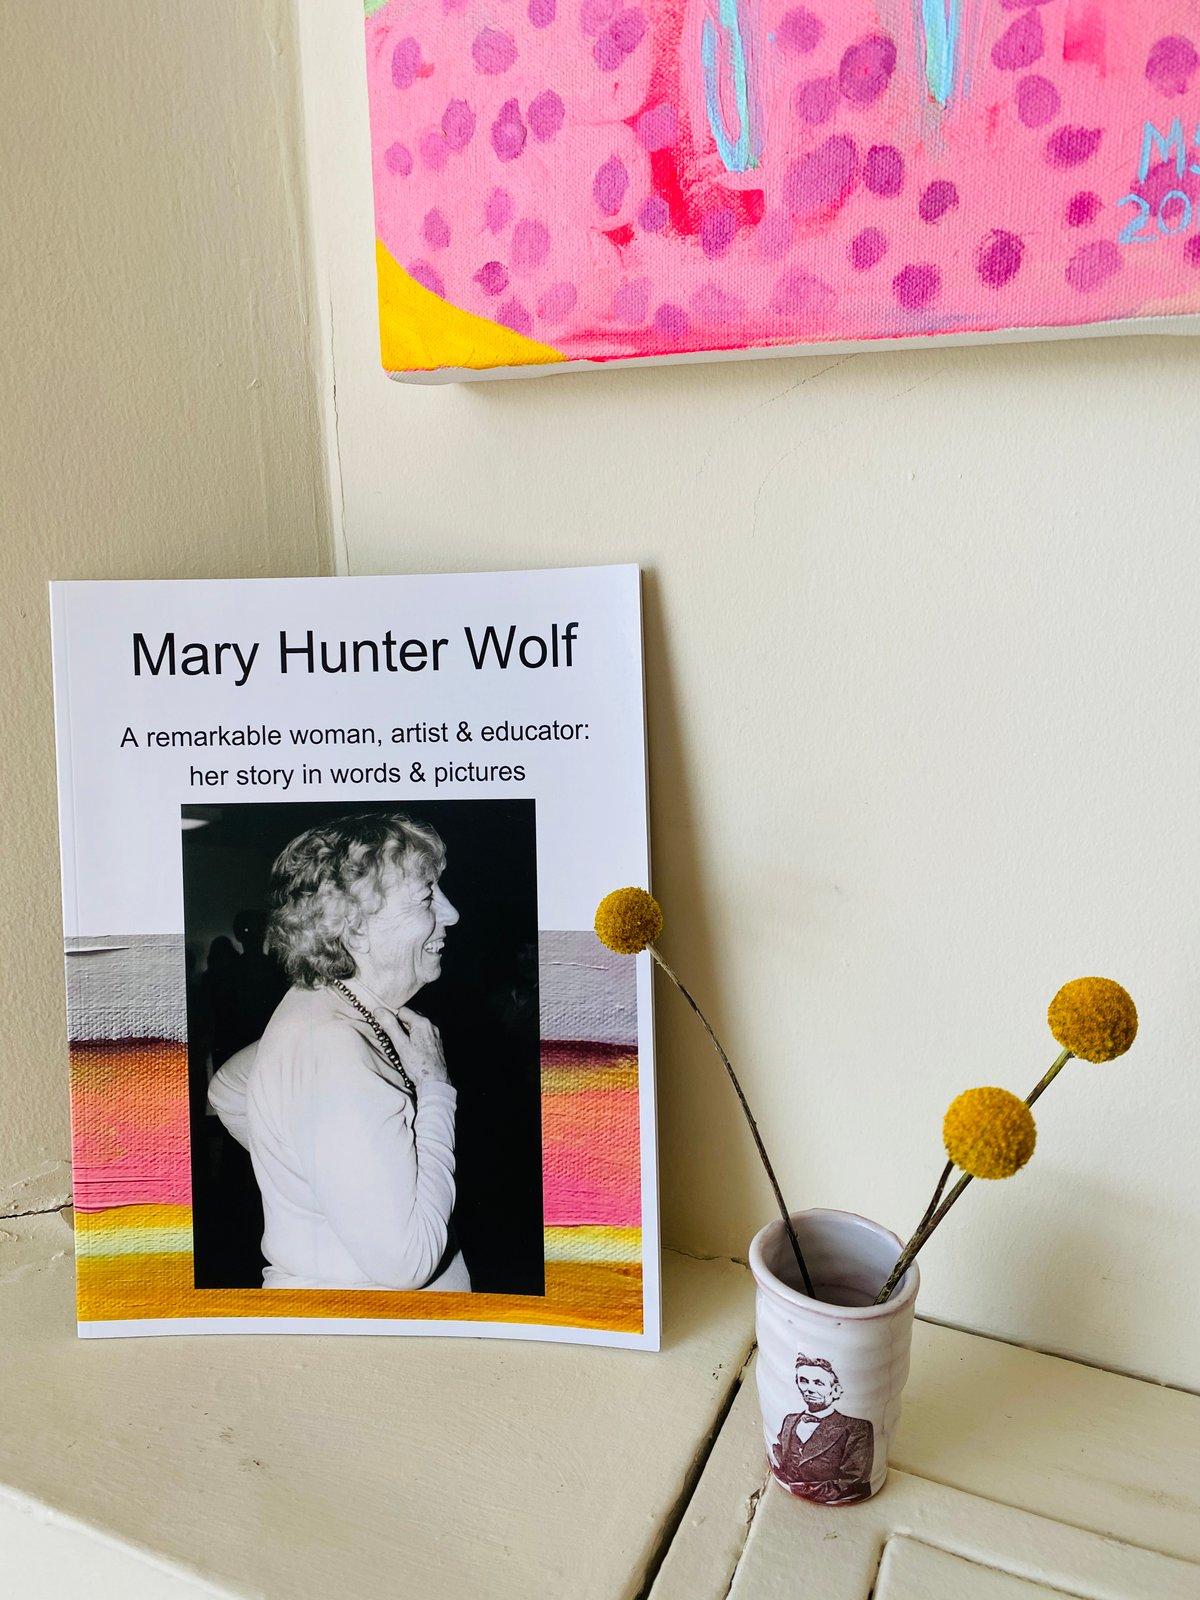 Mary Hunter Wolf